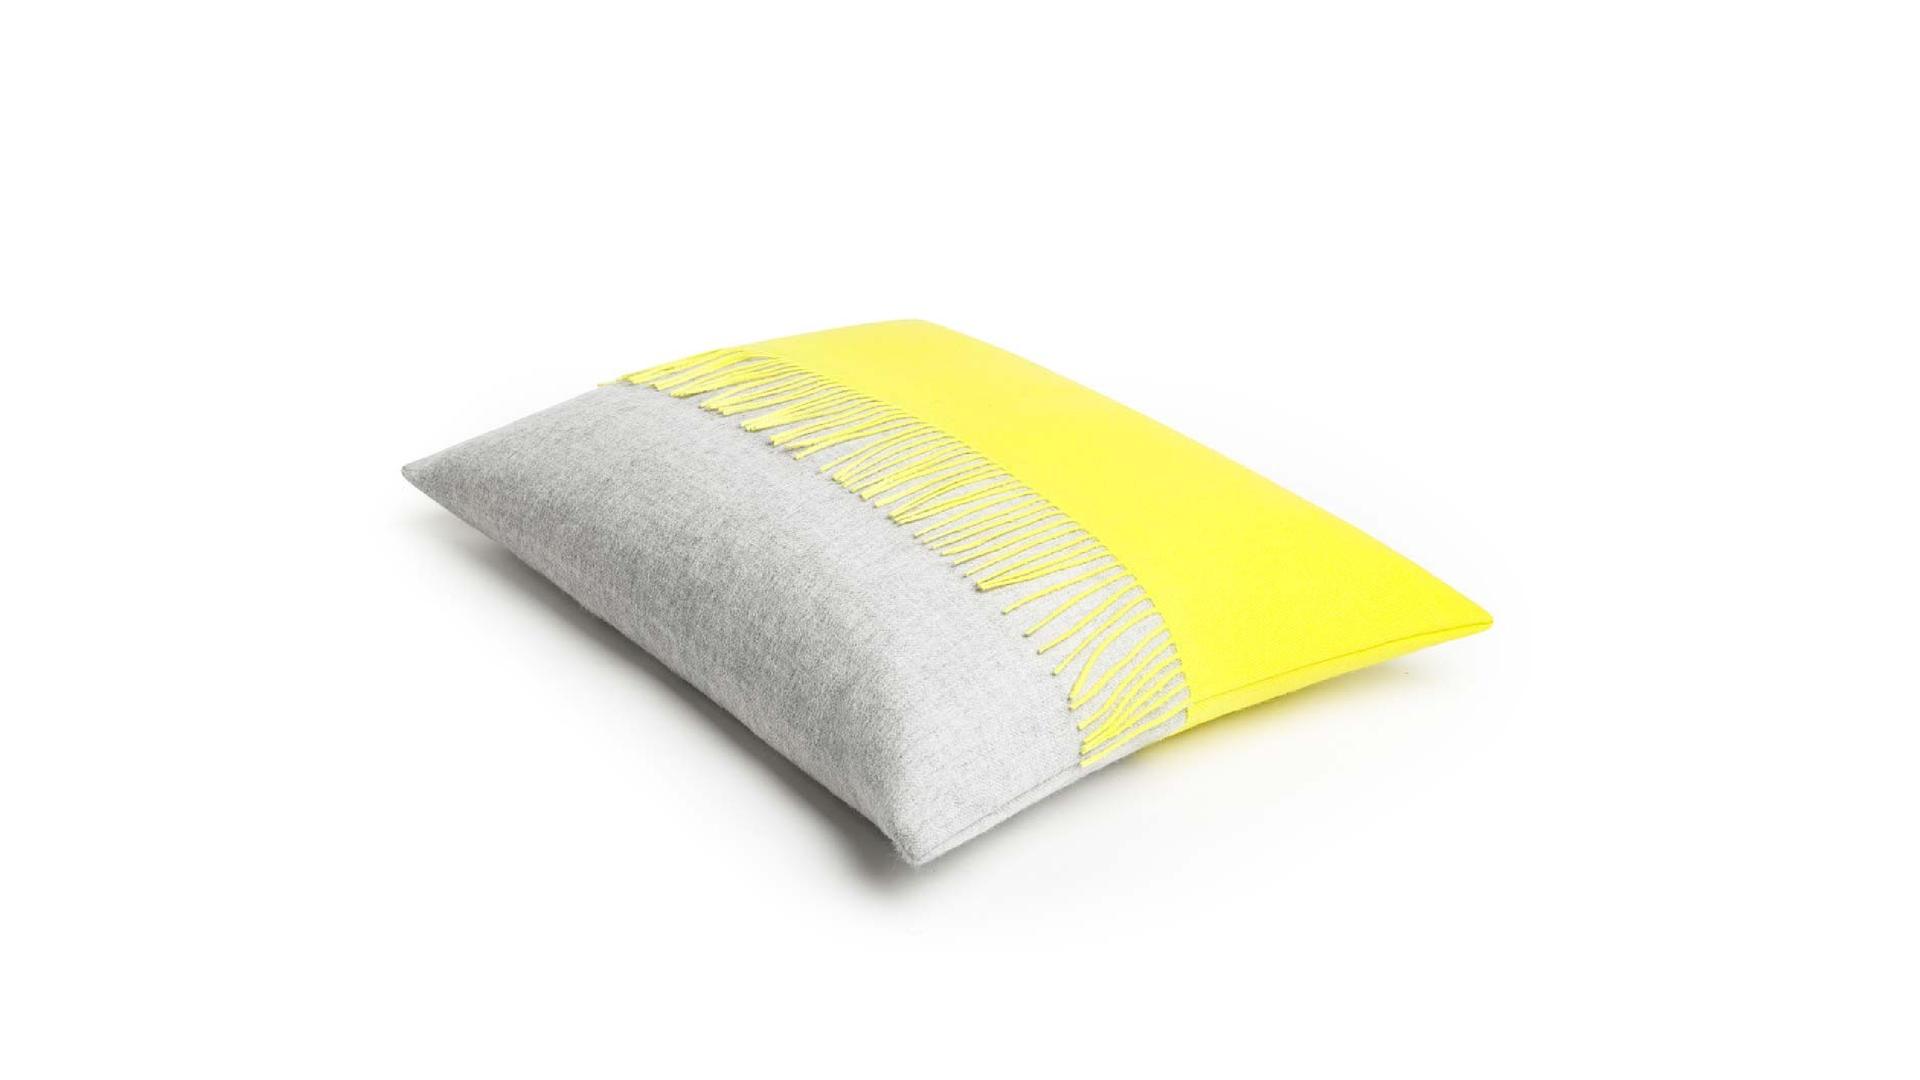 Jazz deco cushion yellow.png